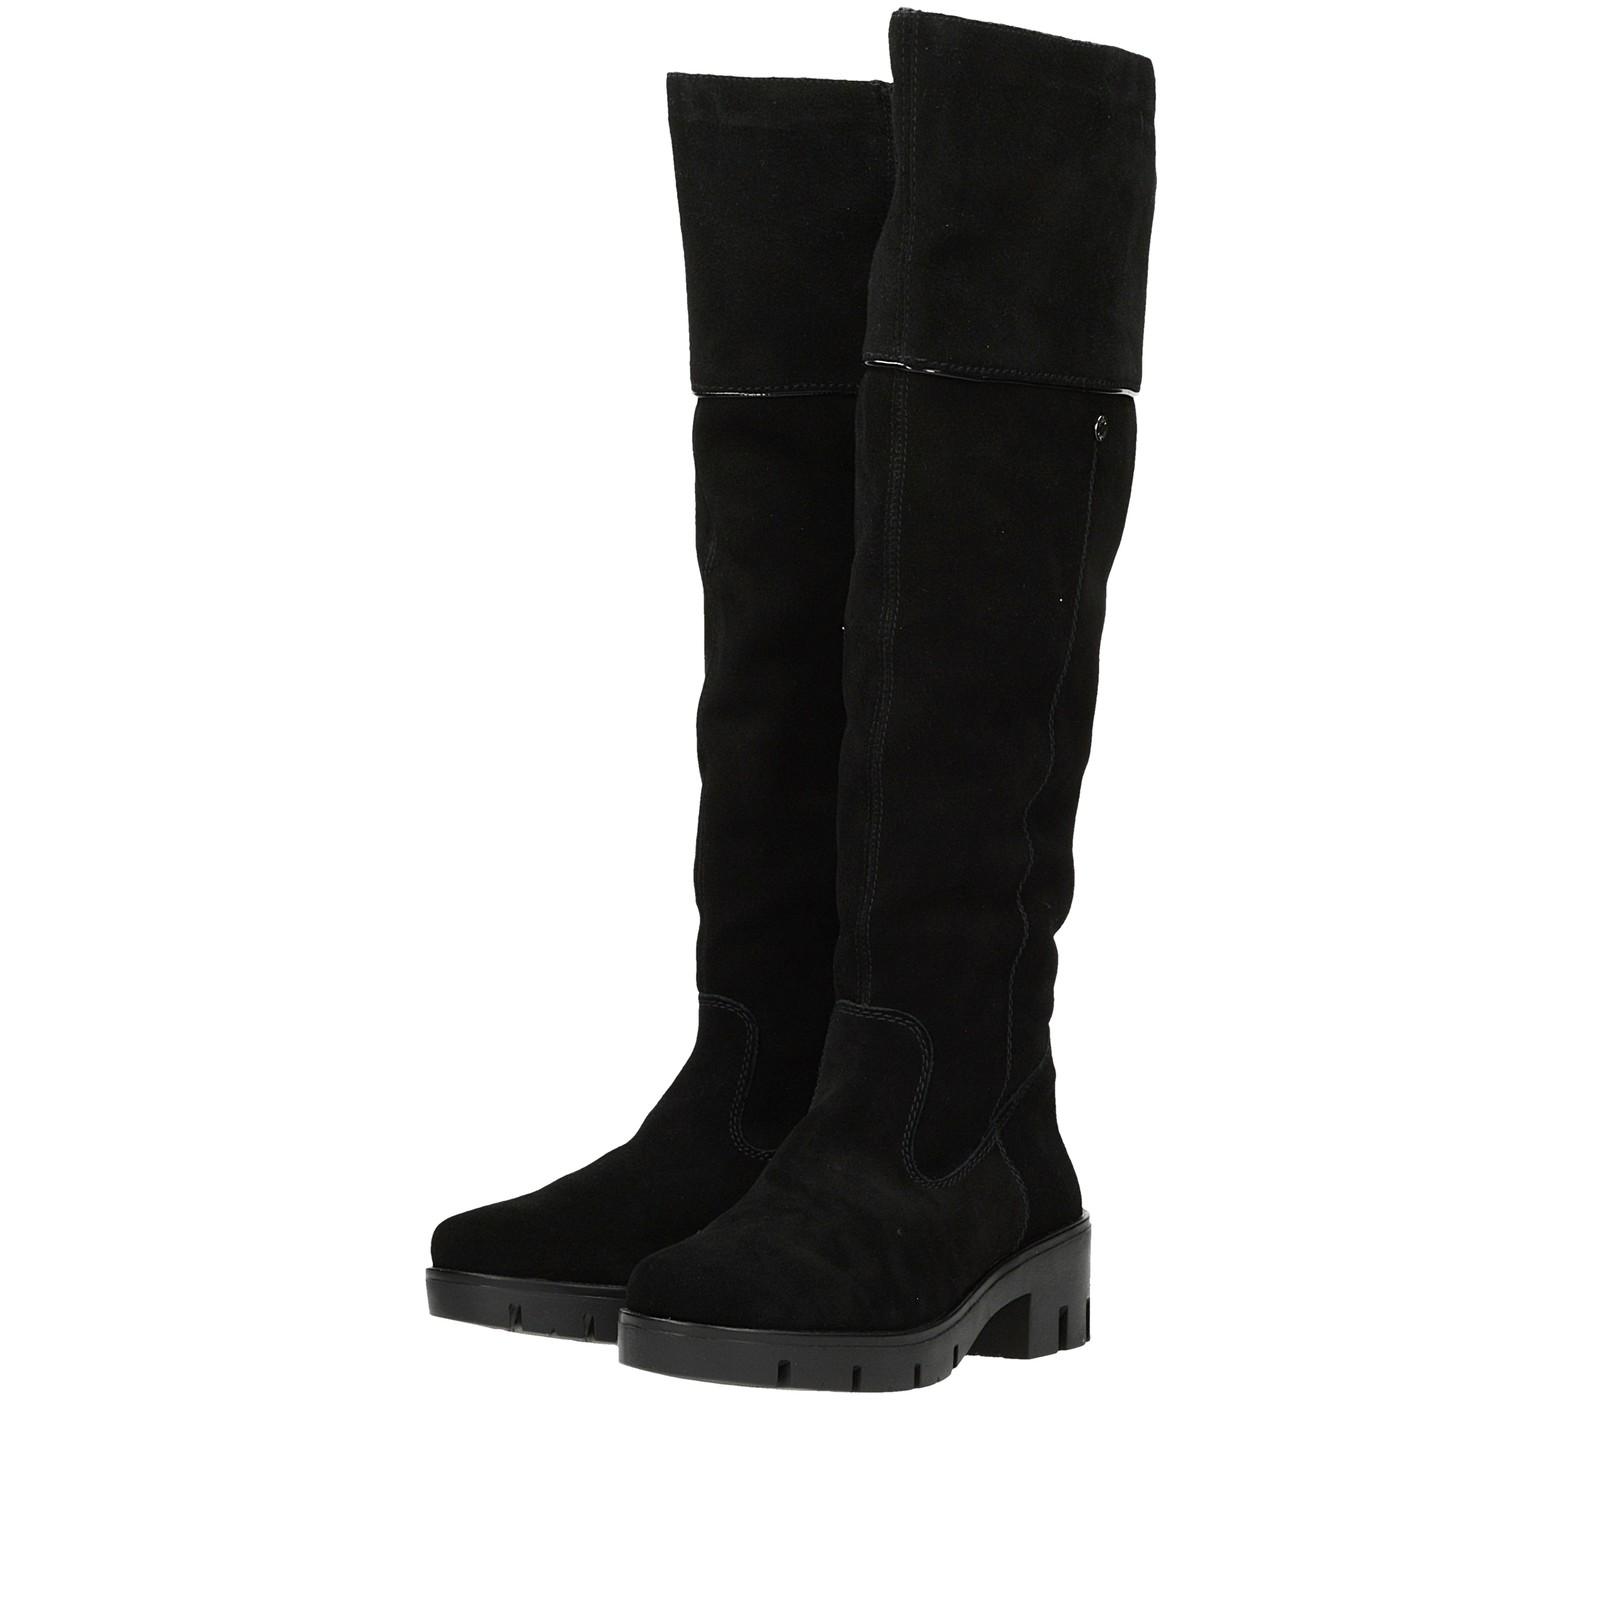 8a25a30fa86c7 Rieker dámske semišové vysoké čižmy - čierne | X205200-BLK www.robel.sk